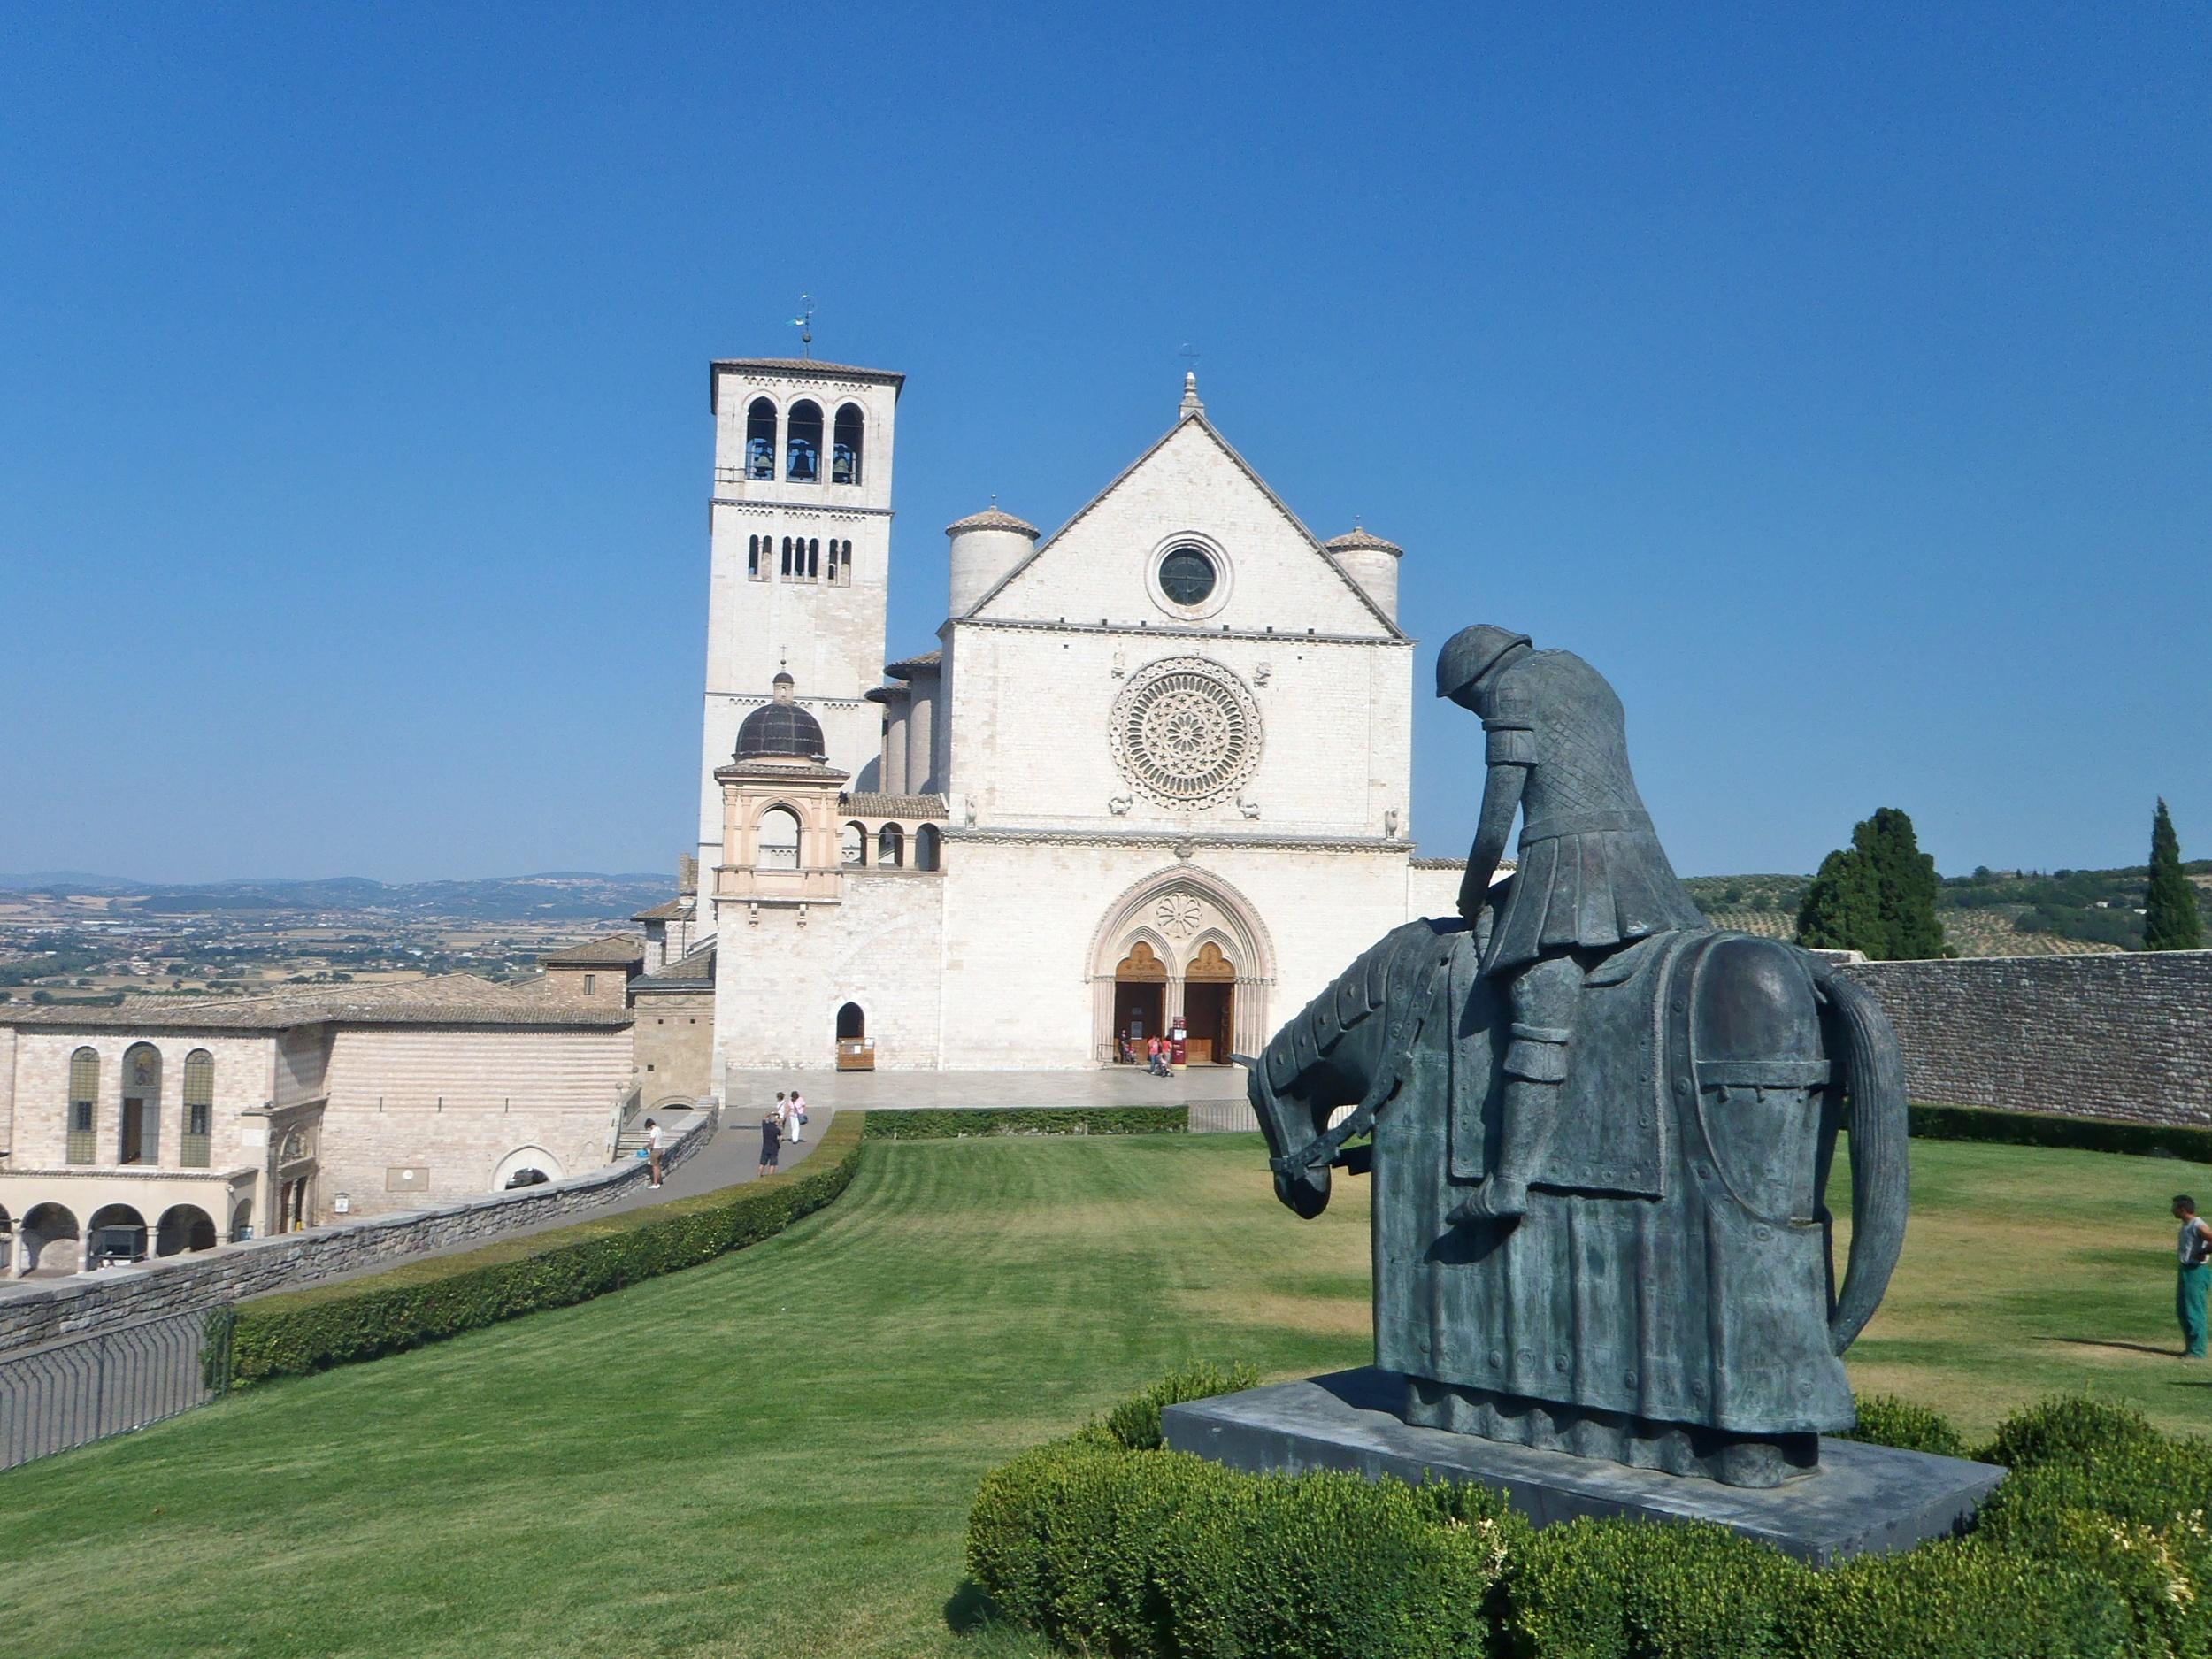 CRO Italy web 2012 - 09.jpg